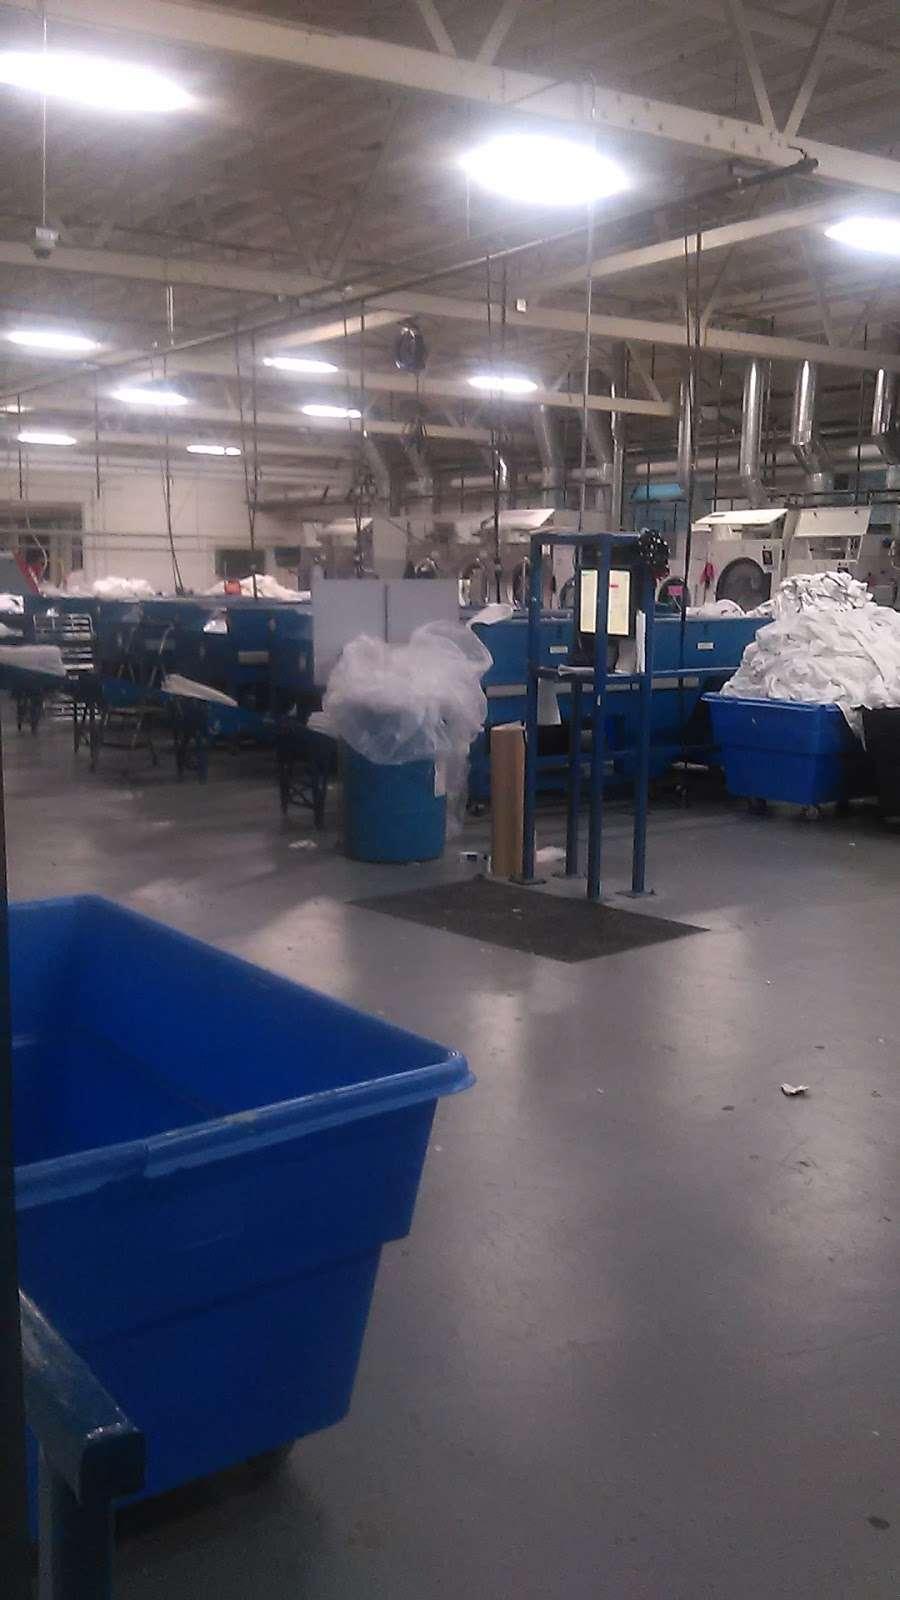 Magic Laundry Services - laundry  | Photo 9 of 10 | Address: 412 W Roosevelt Ave, Montebello, CA 90640, USA | Phone: (323) 726-4061